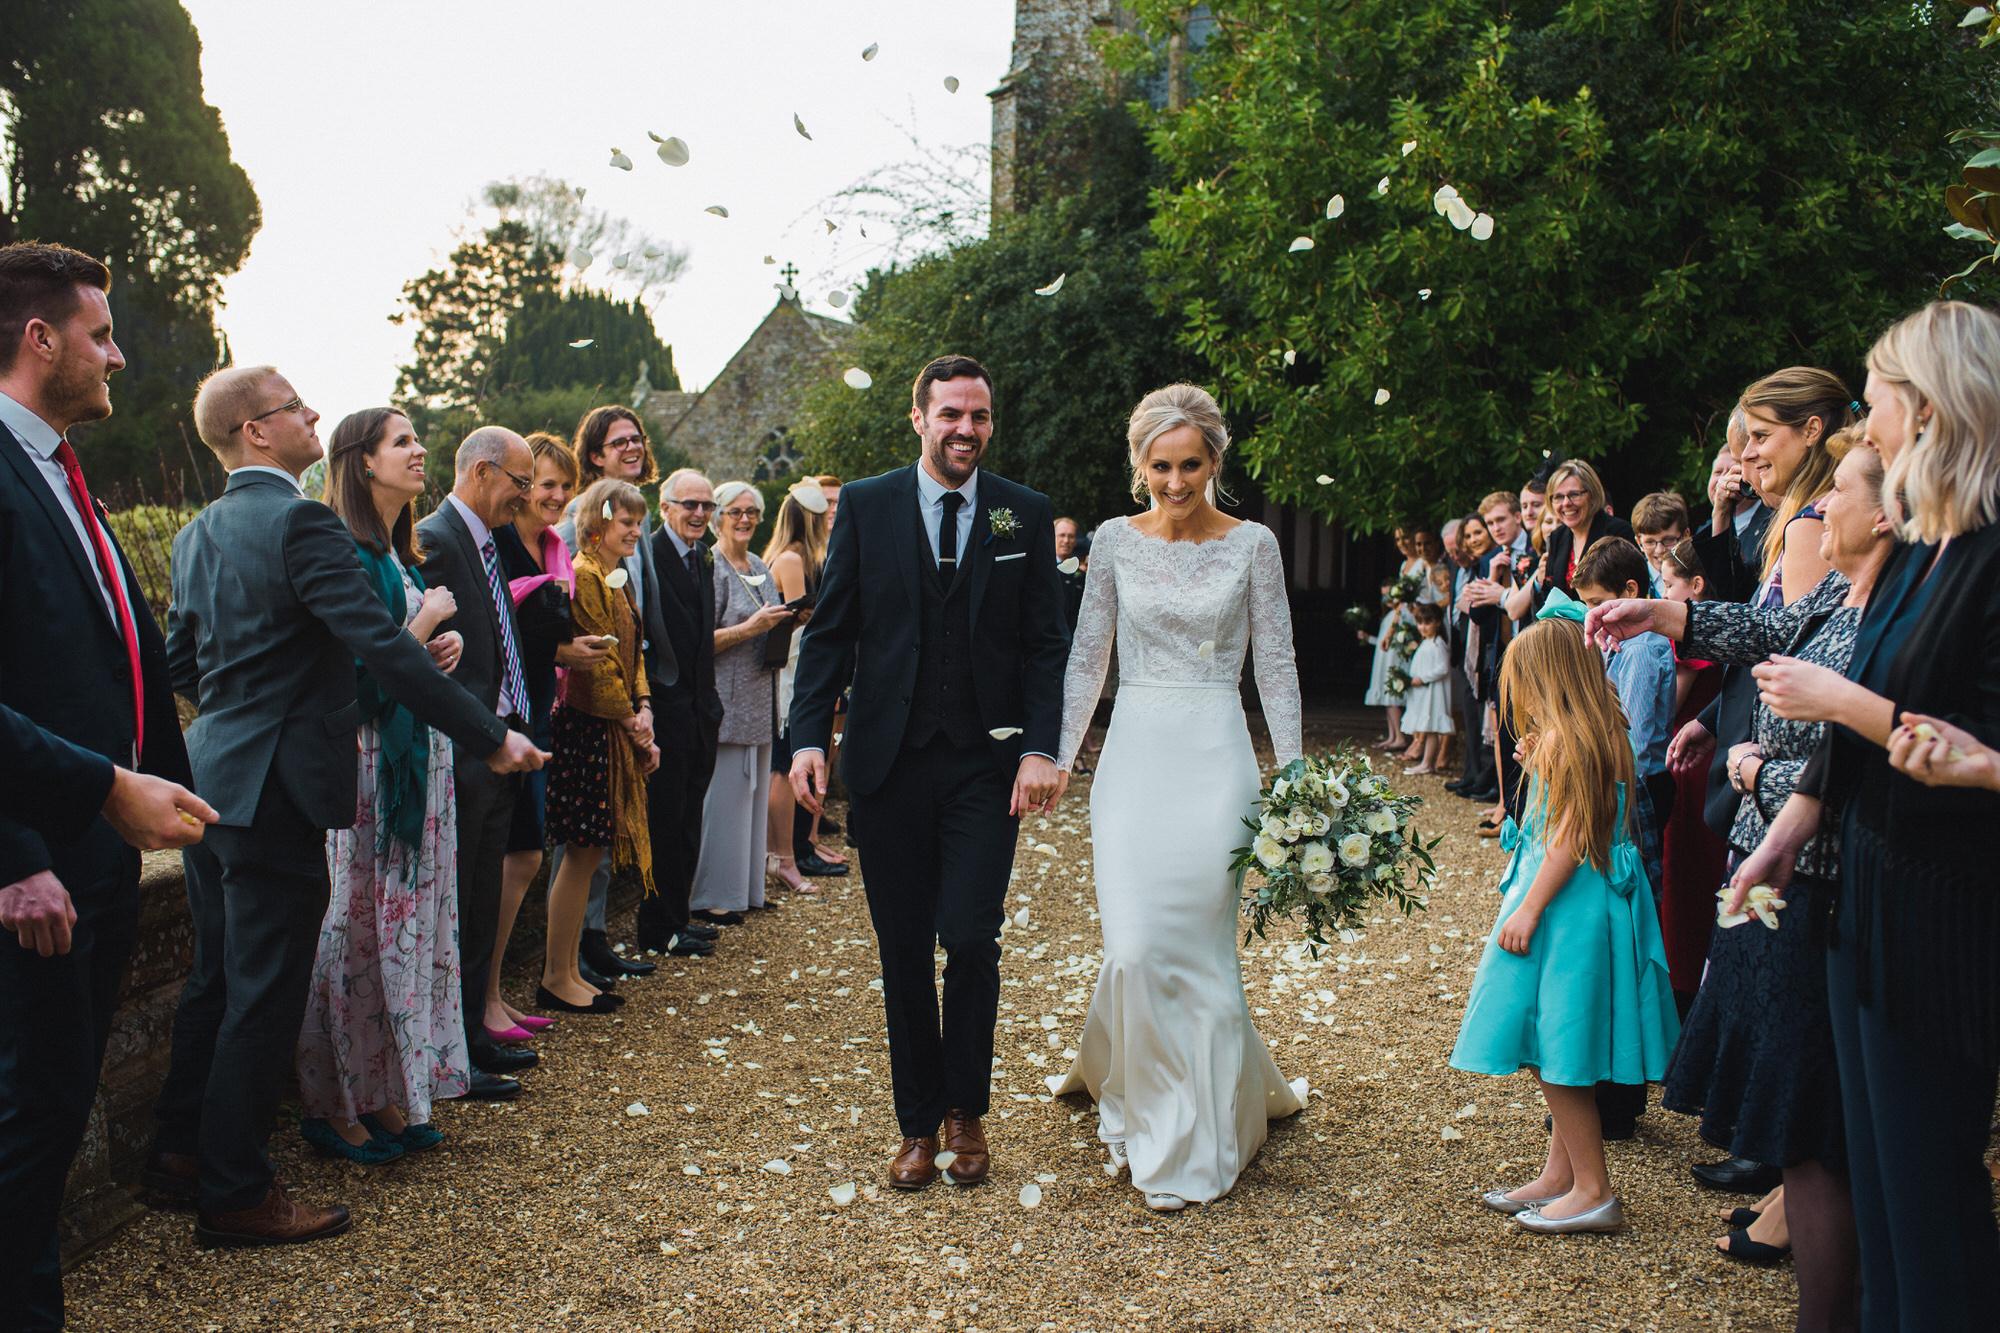 Brympton House wedding confetti by simon biffen photography 24